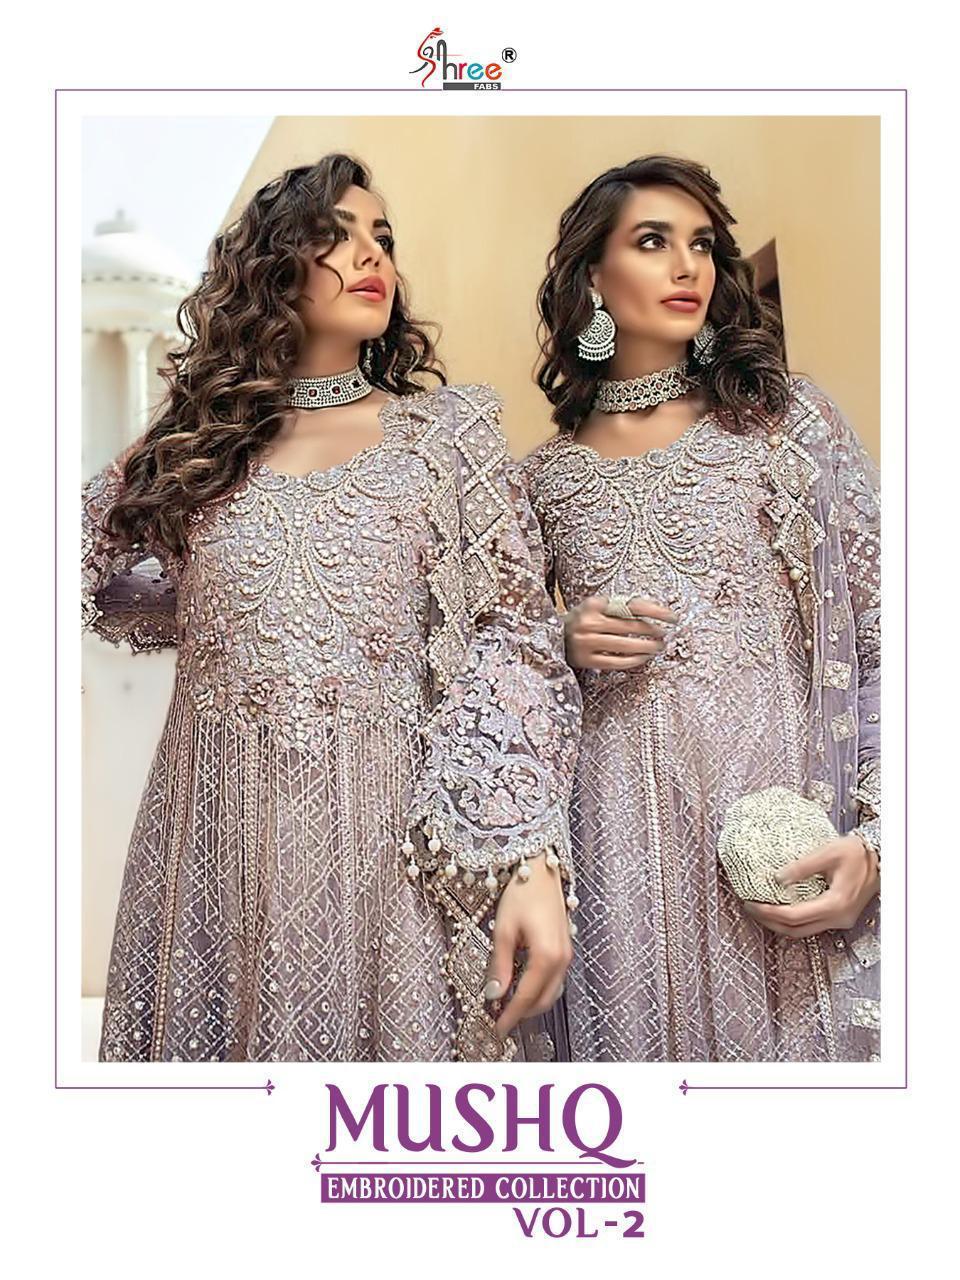 Shree Fabs Mushq Embroidered Collection Vol 2 Salwar Suit Wholesale Catalog 4 Pcs 1 - Shree Fabs Mushq Embroidered Collection Vol 2 Salwar Suit Wholesale Catalog 4 Pcs